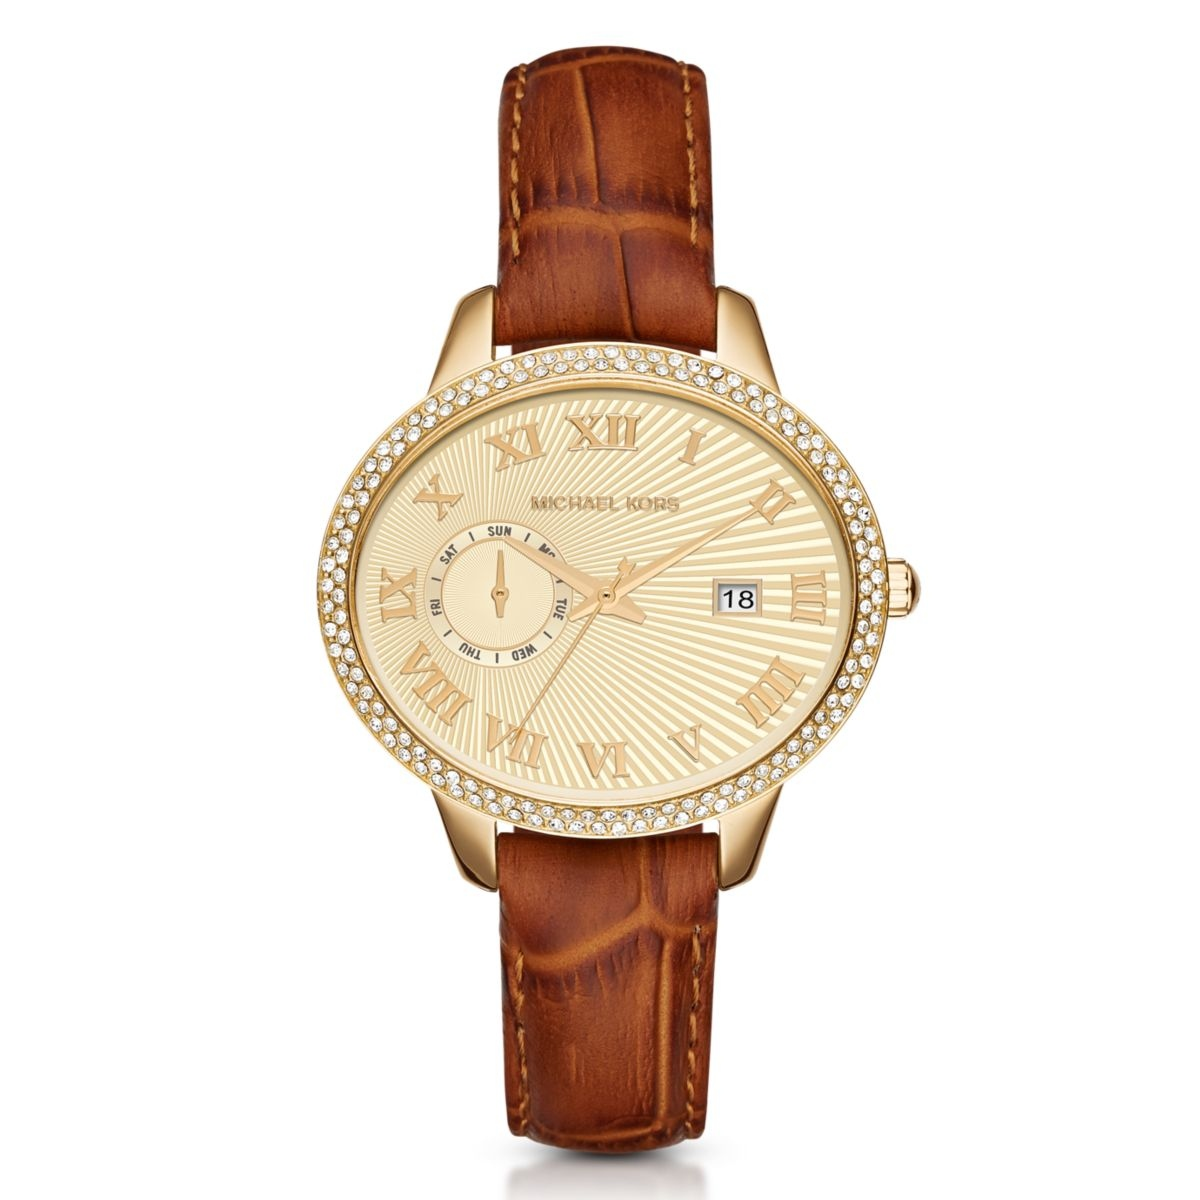 часы michael kors мужские цена оригинал ароматов